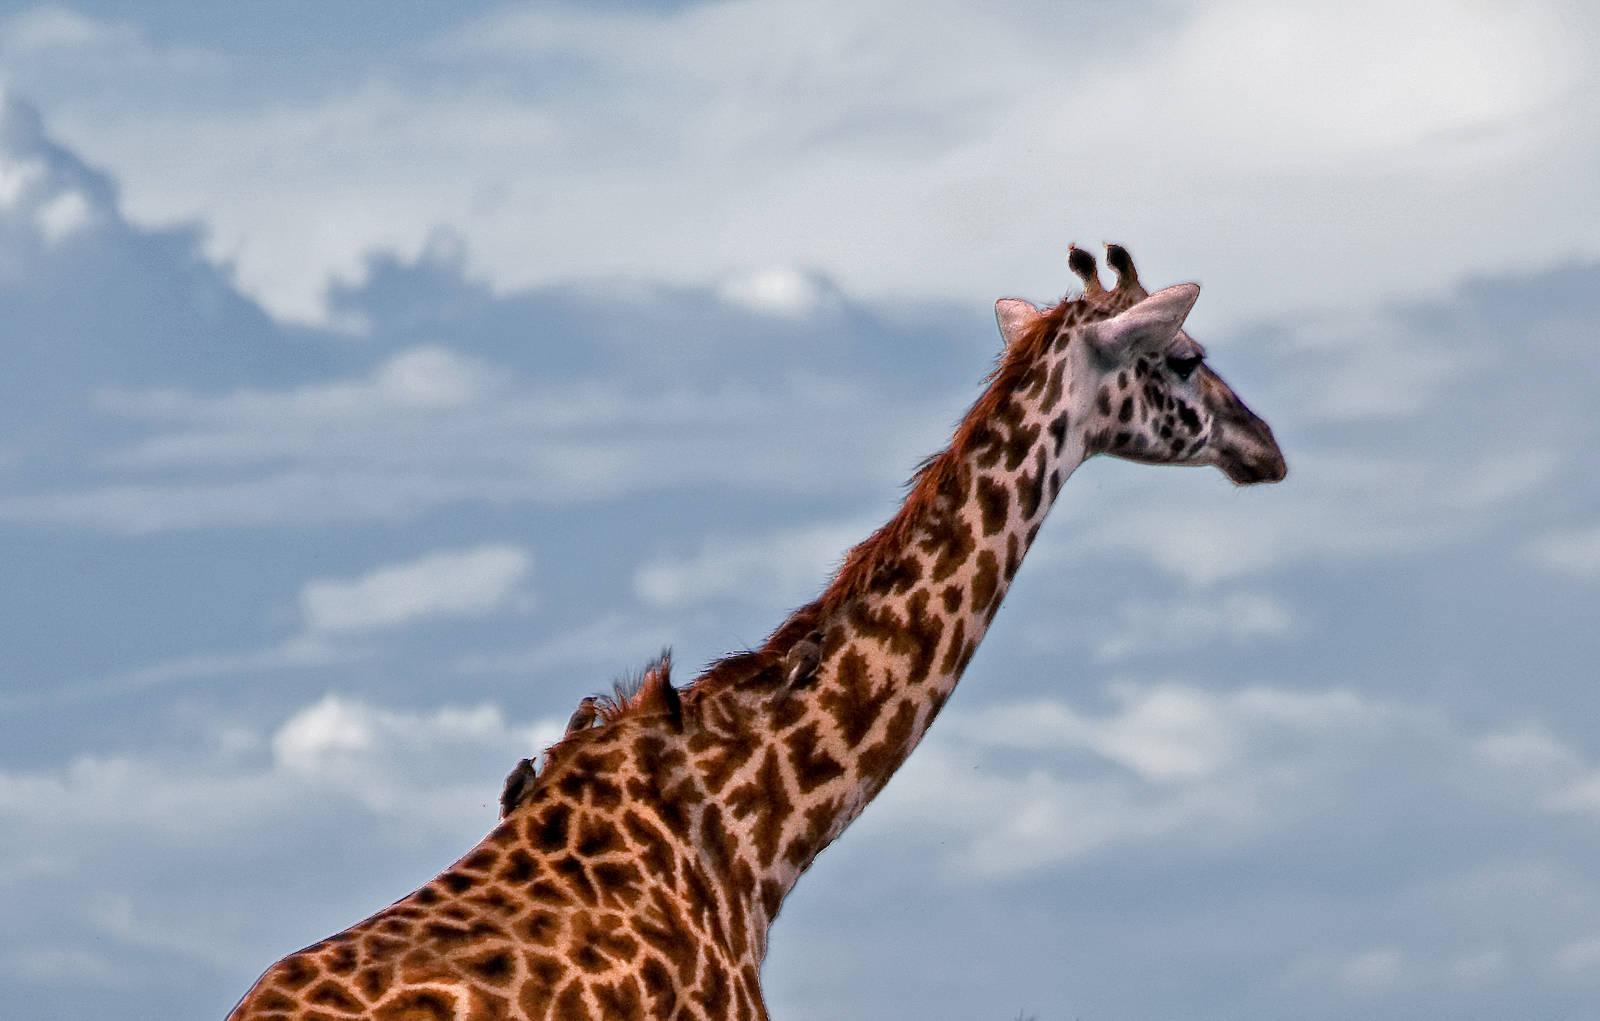 Masai giraffe with ox-peckers